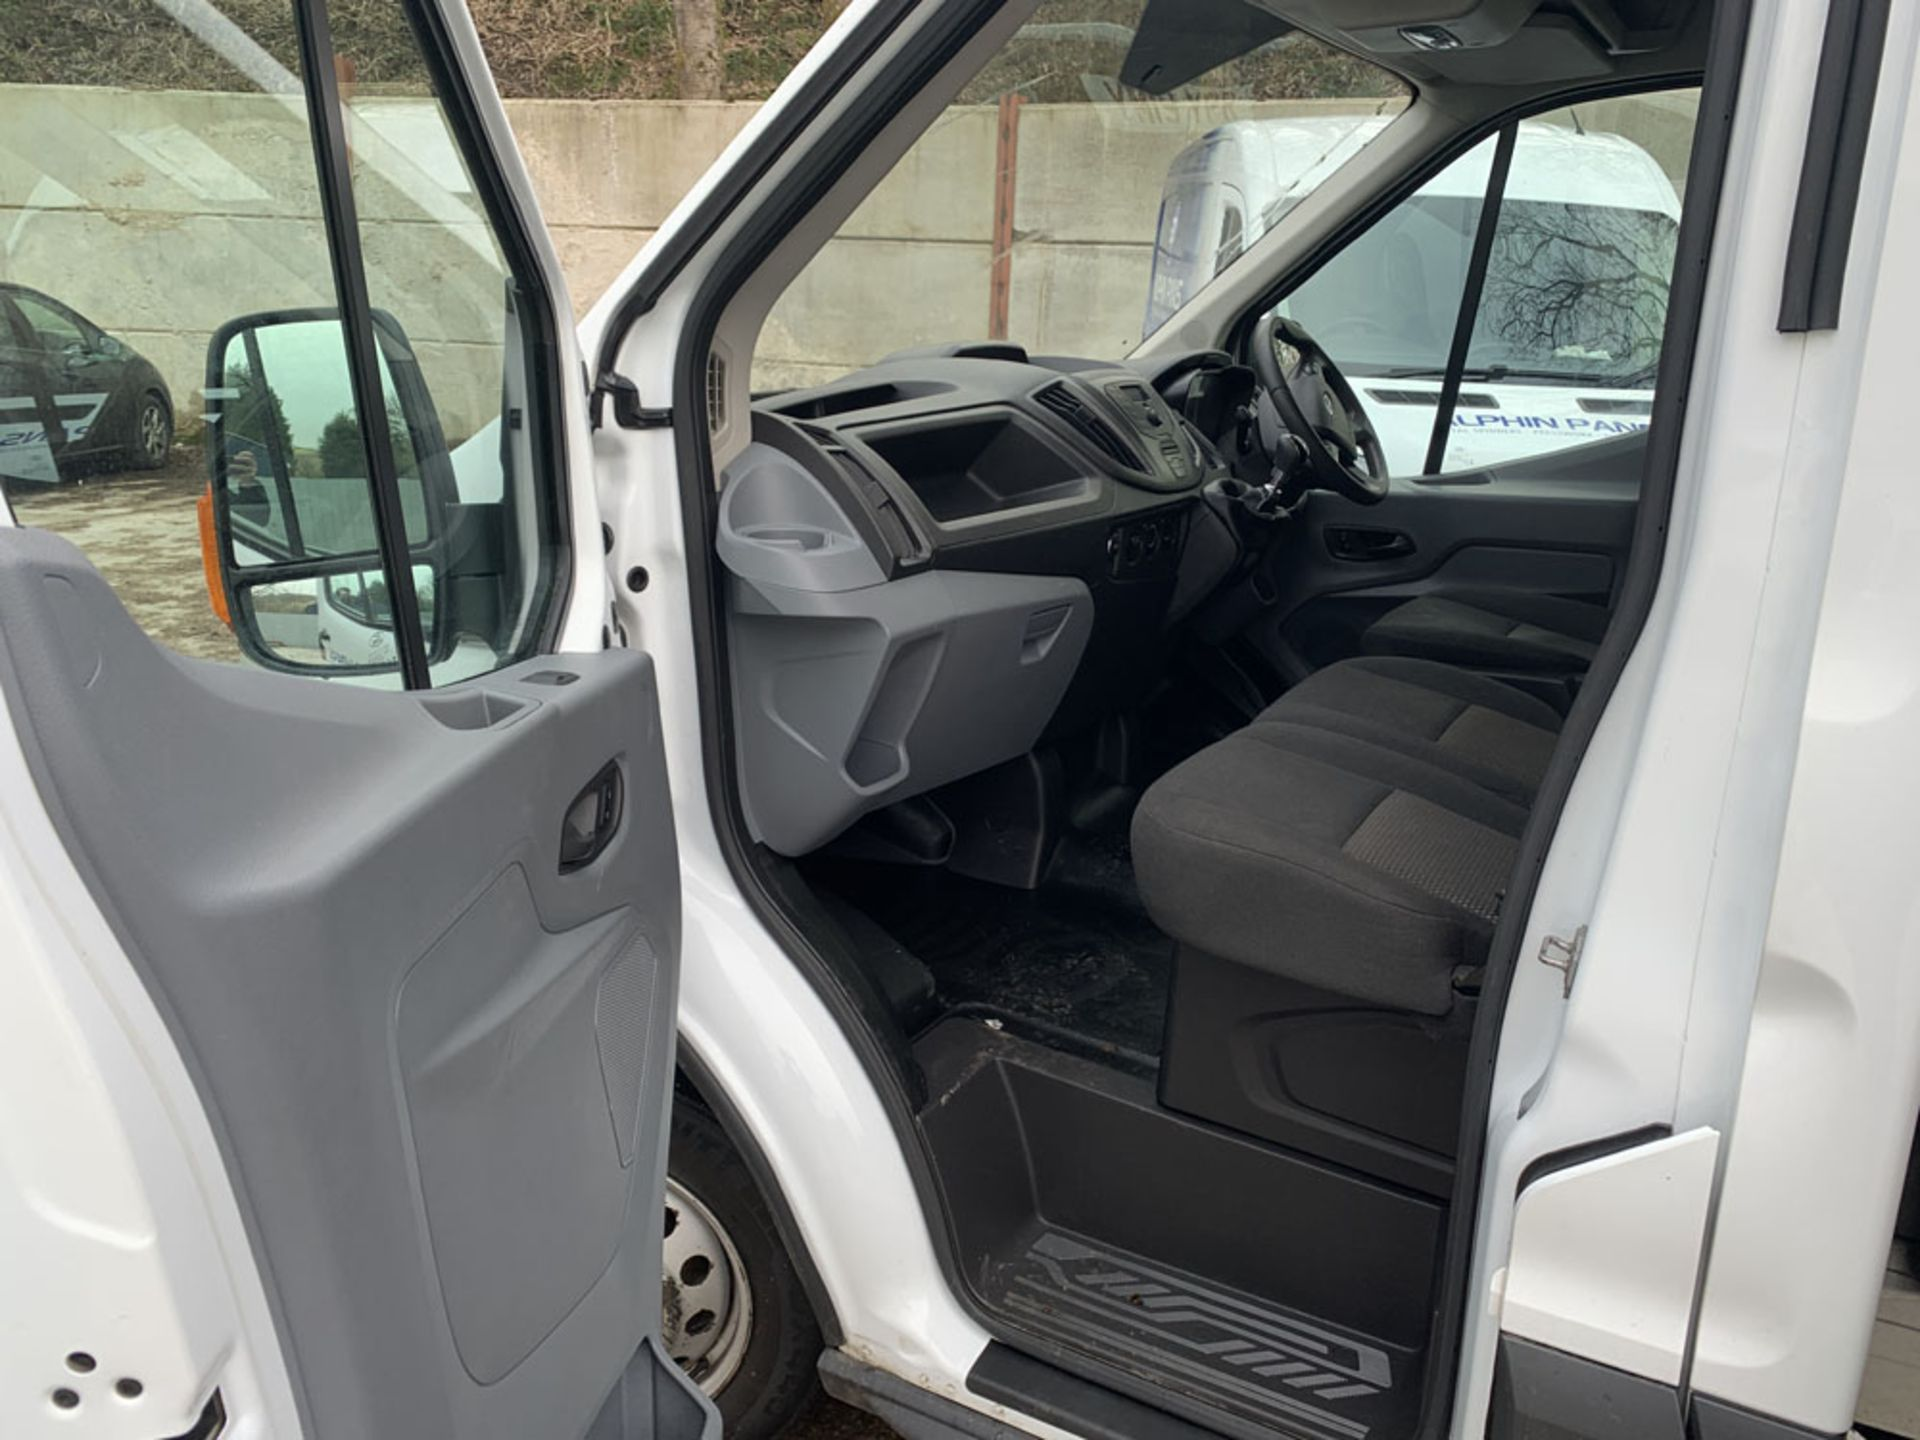 Ford Transit Curtain-Sider. 2016 (65 Reg). 152,241 Miles. 2.2 Ltr Diesel. Standard Cab. - Image 11 of 17